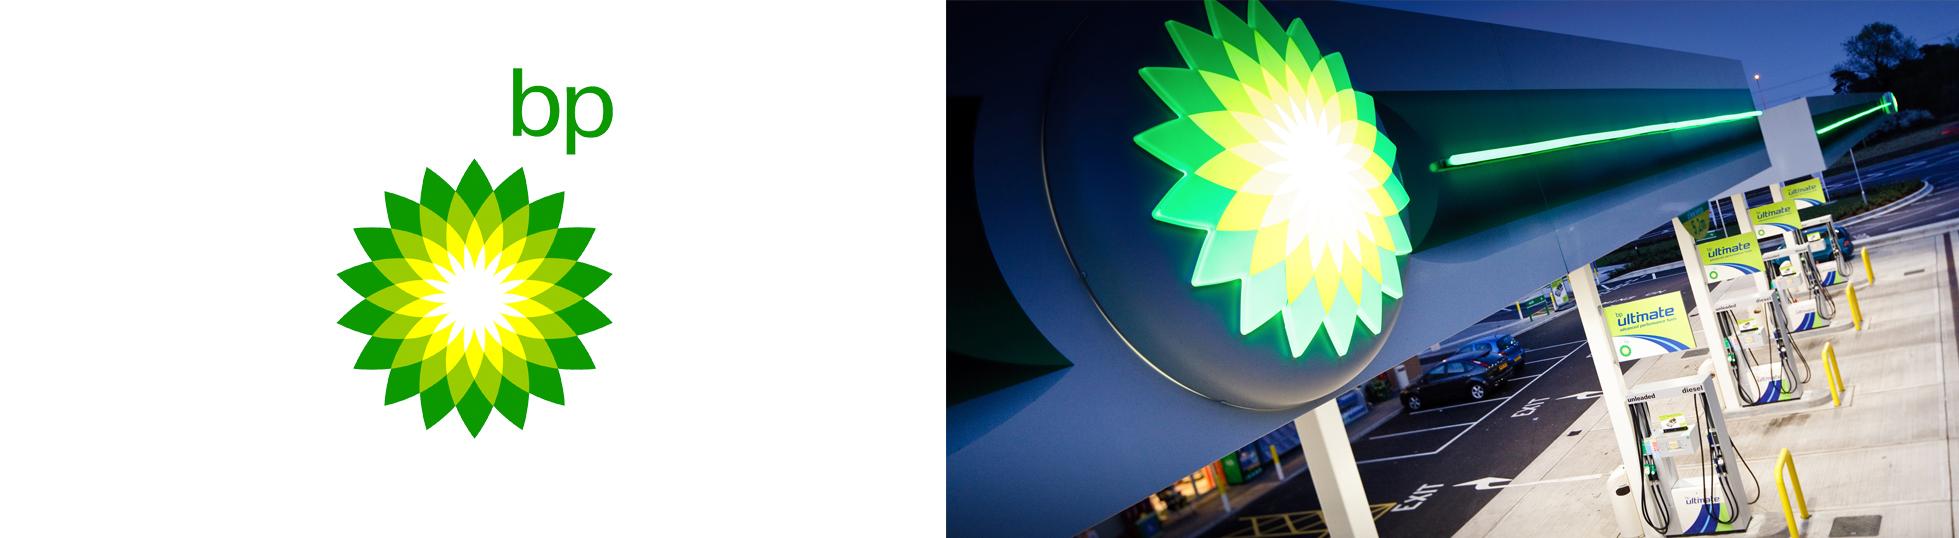 BP logo, designed by  Landor